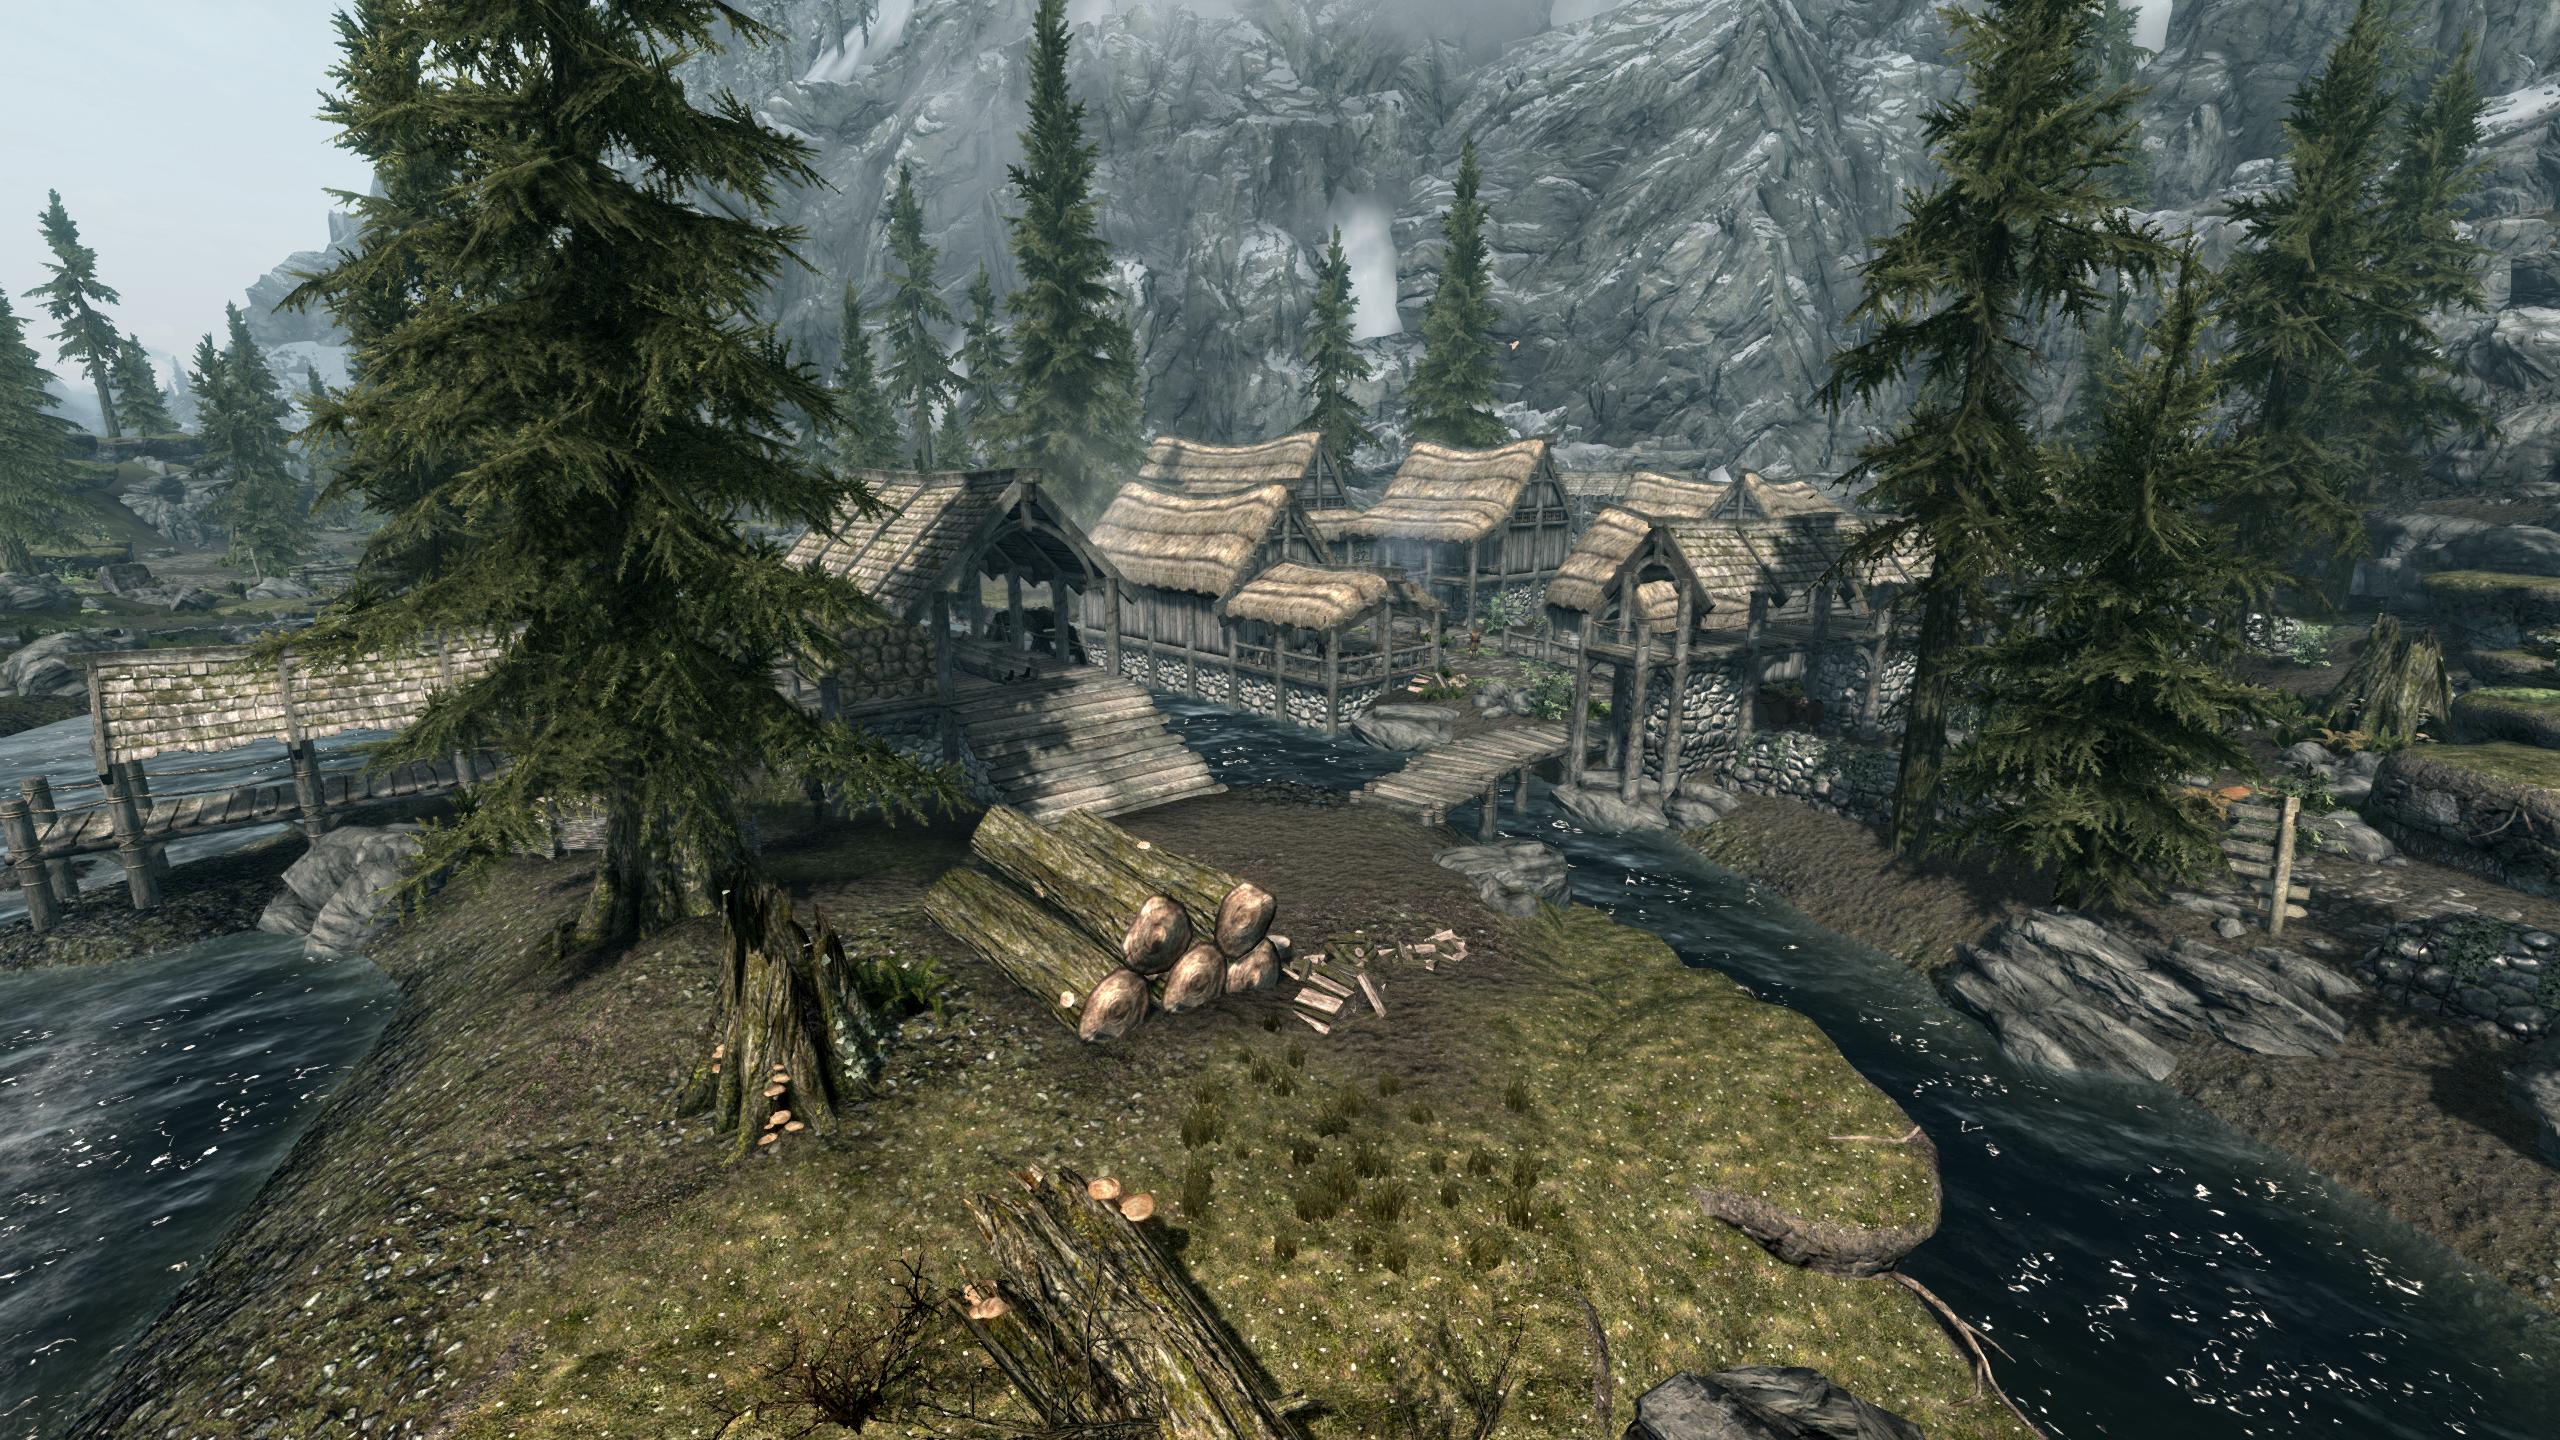 Riverwood (Skyrim)